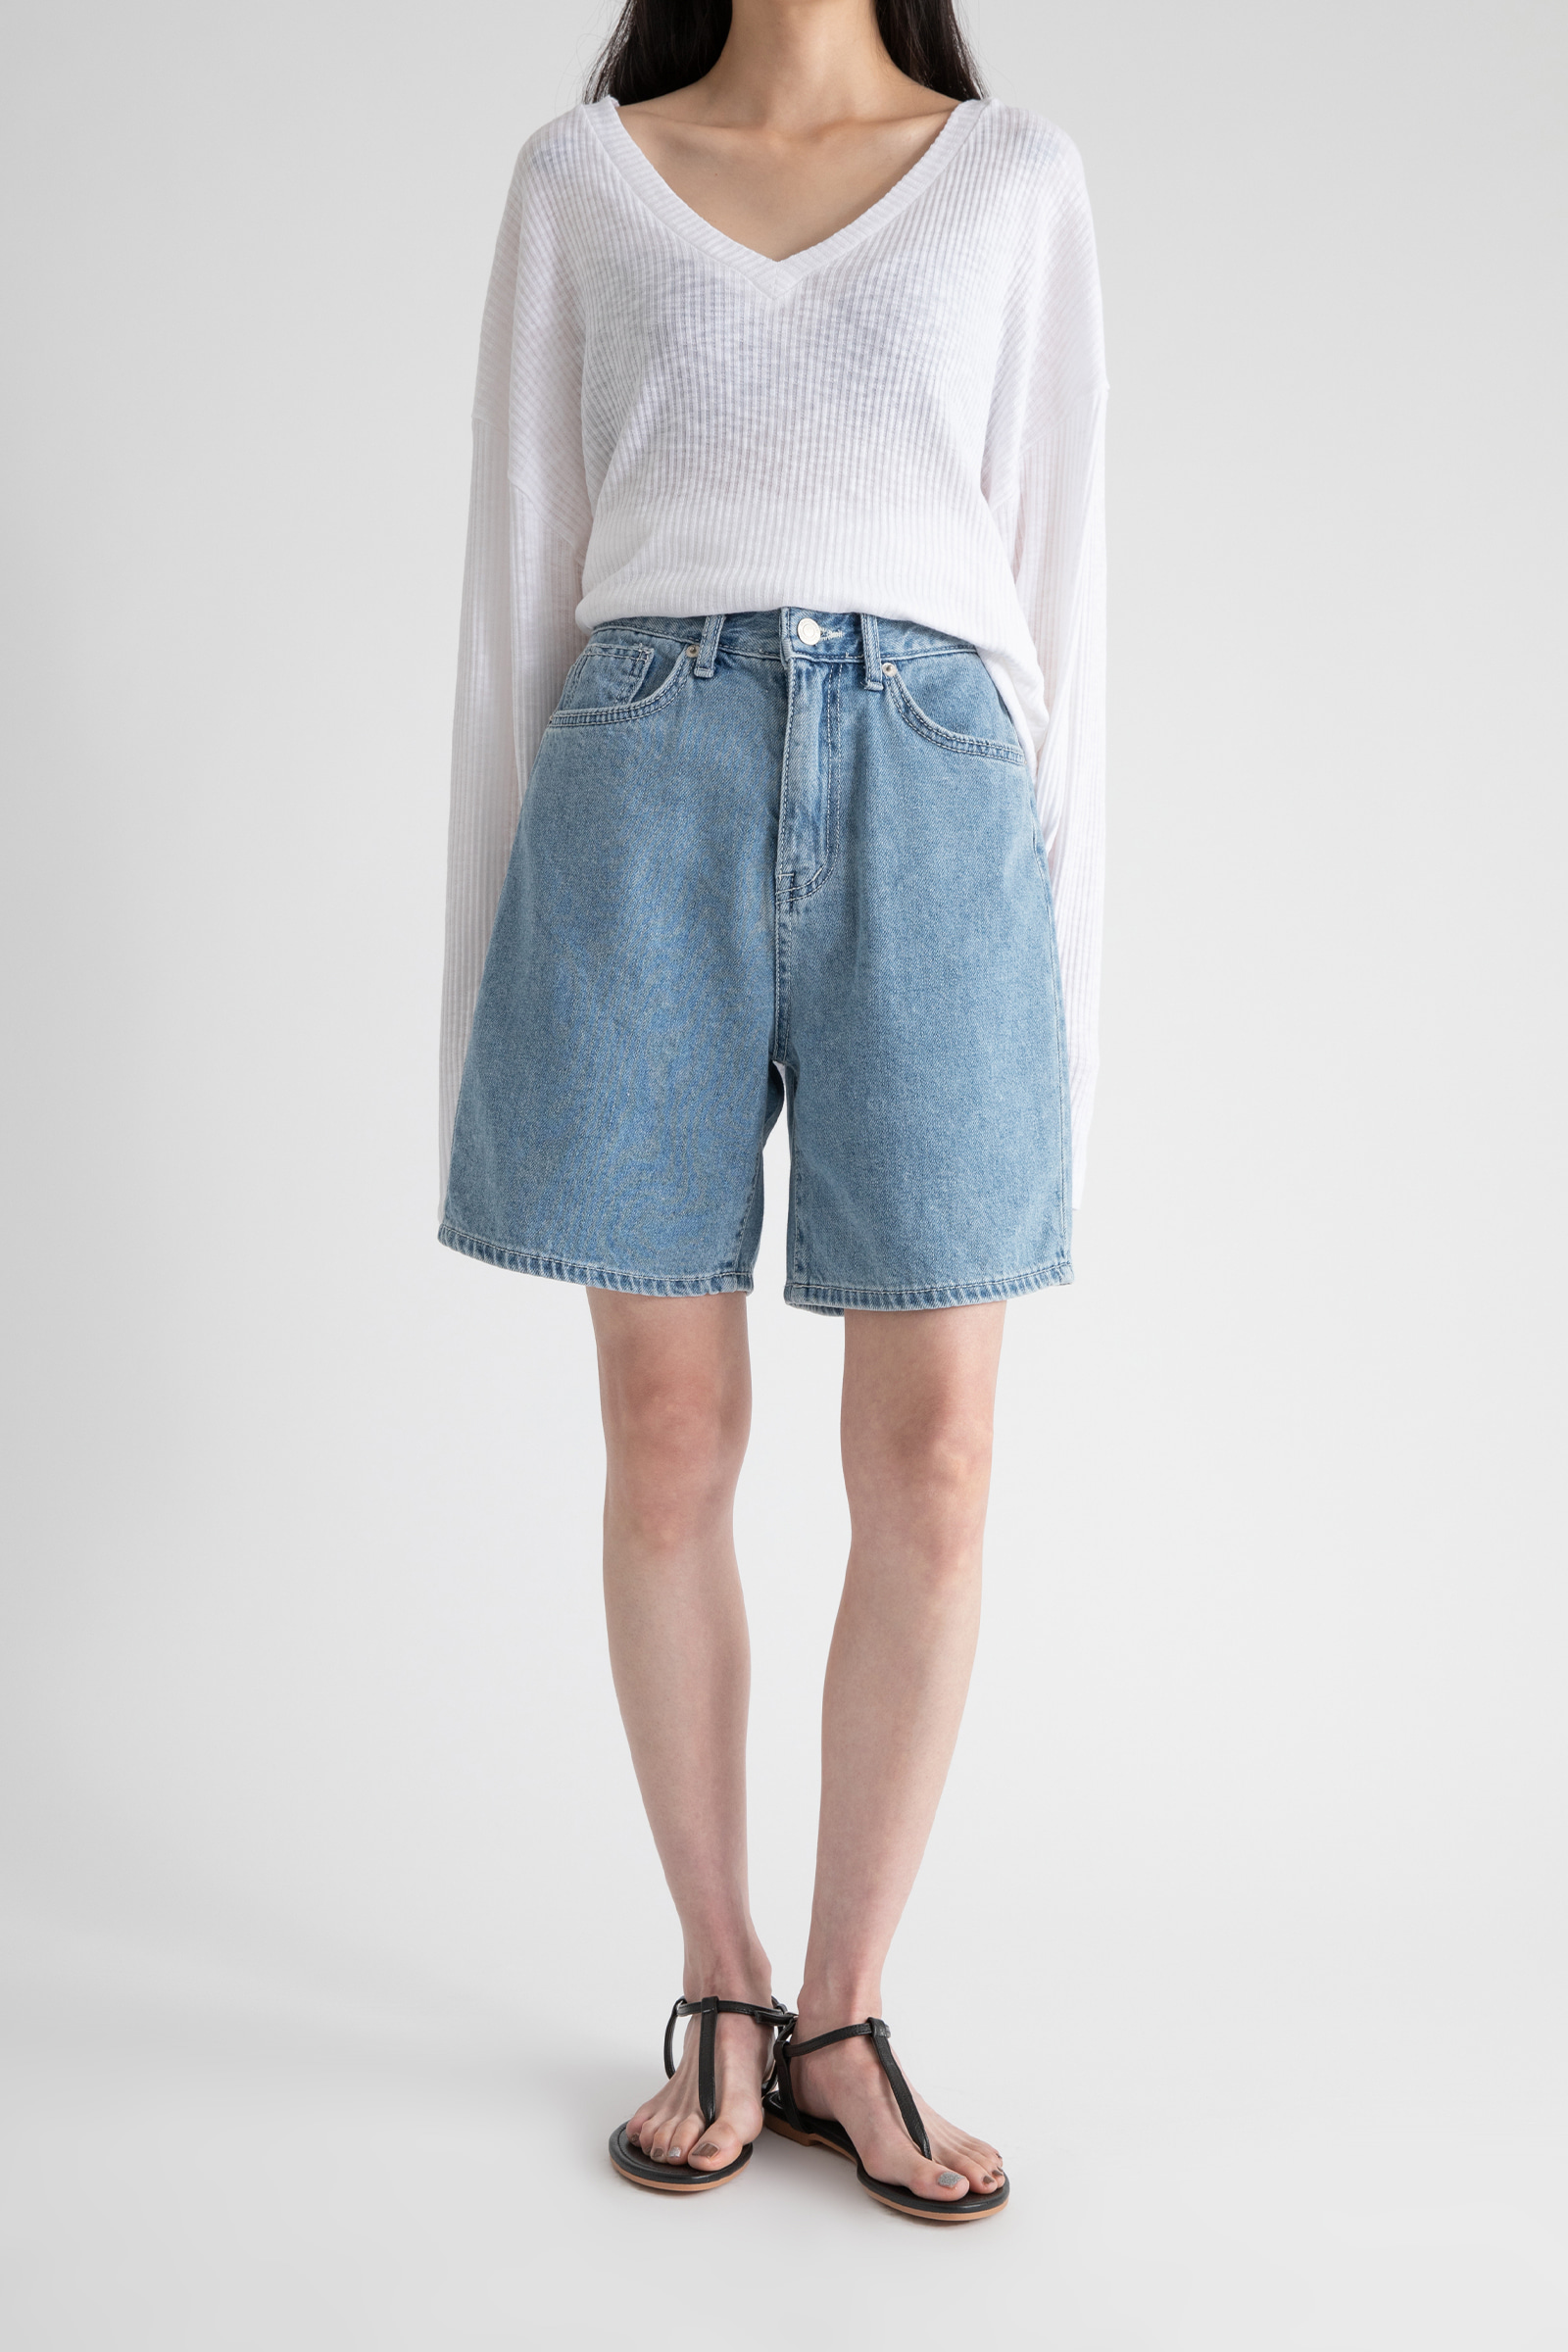 Work high-rise half jeans